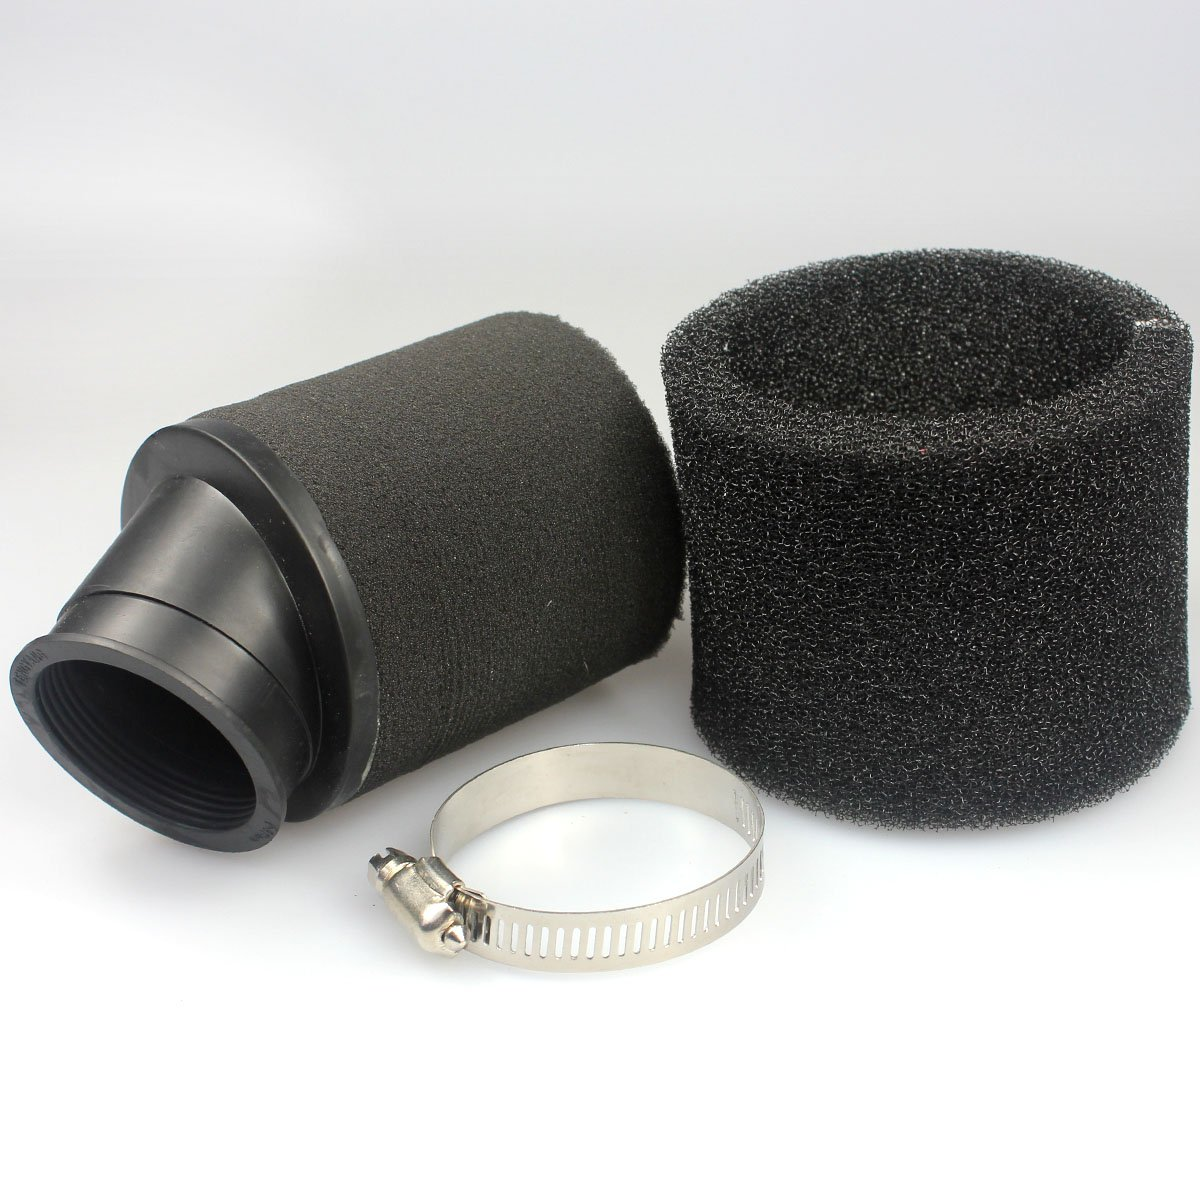 alas 48/mm Negro Espuma filtro de aire claro para Honda Yamaha Suzuki 172/mm 250/cc ATV Scooter Ciclomotor